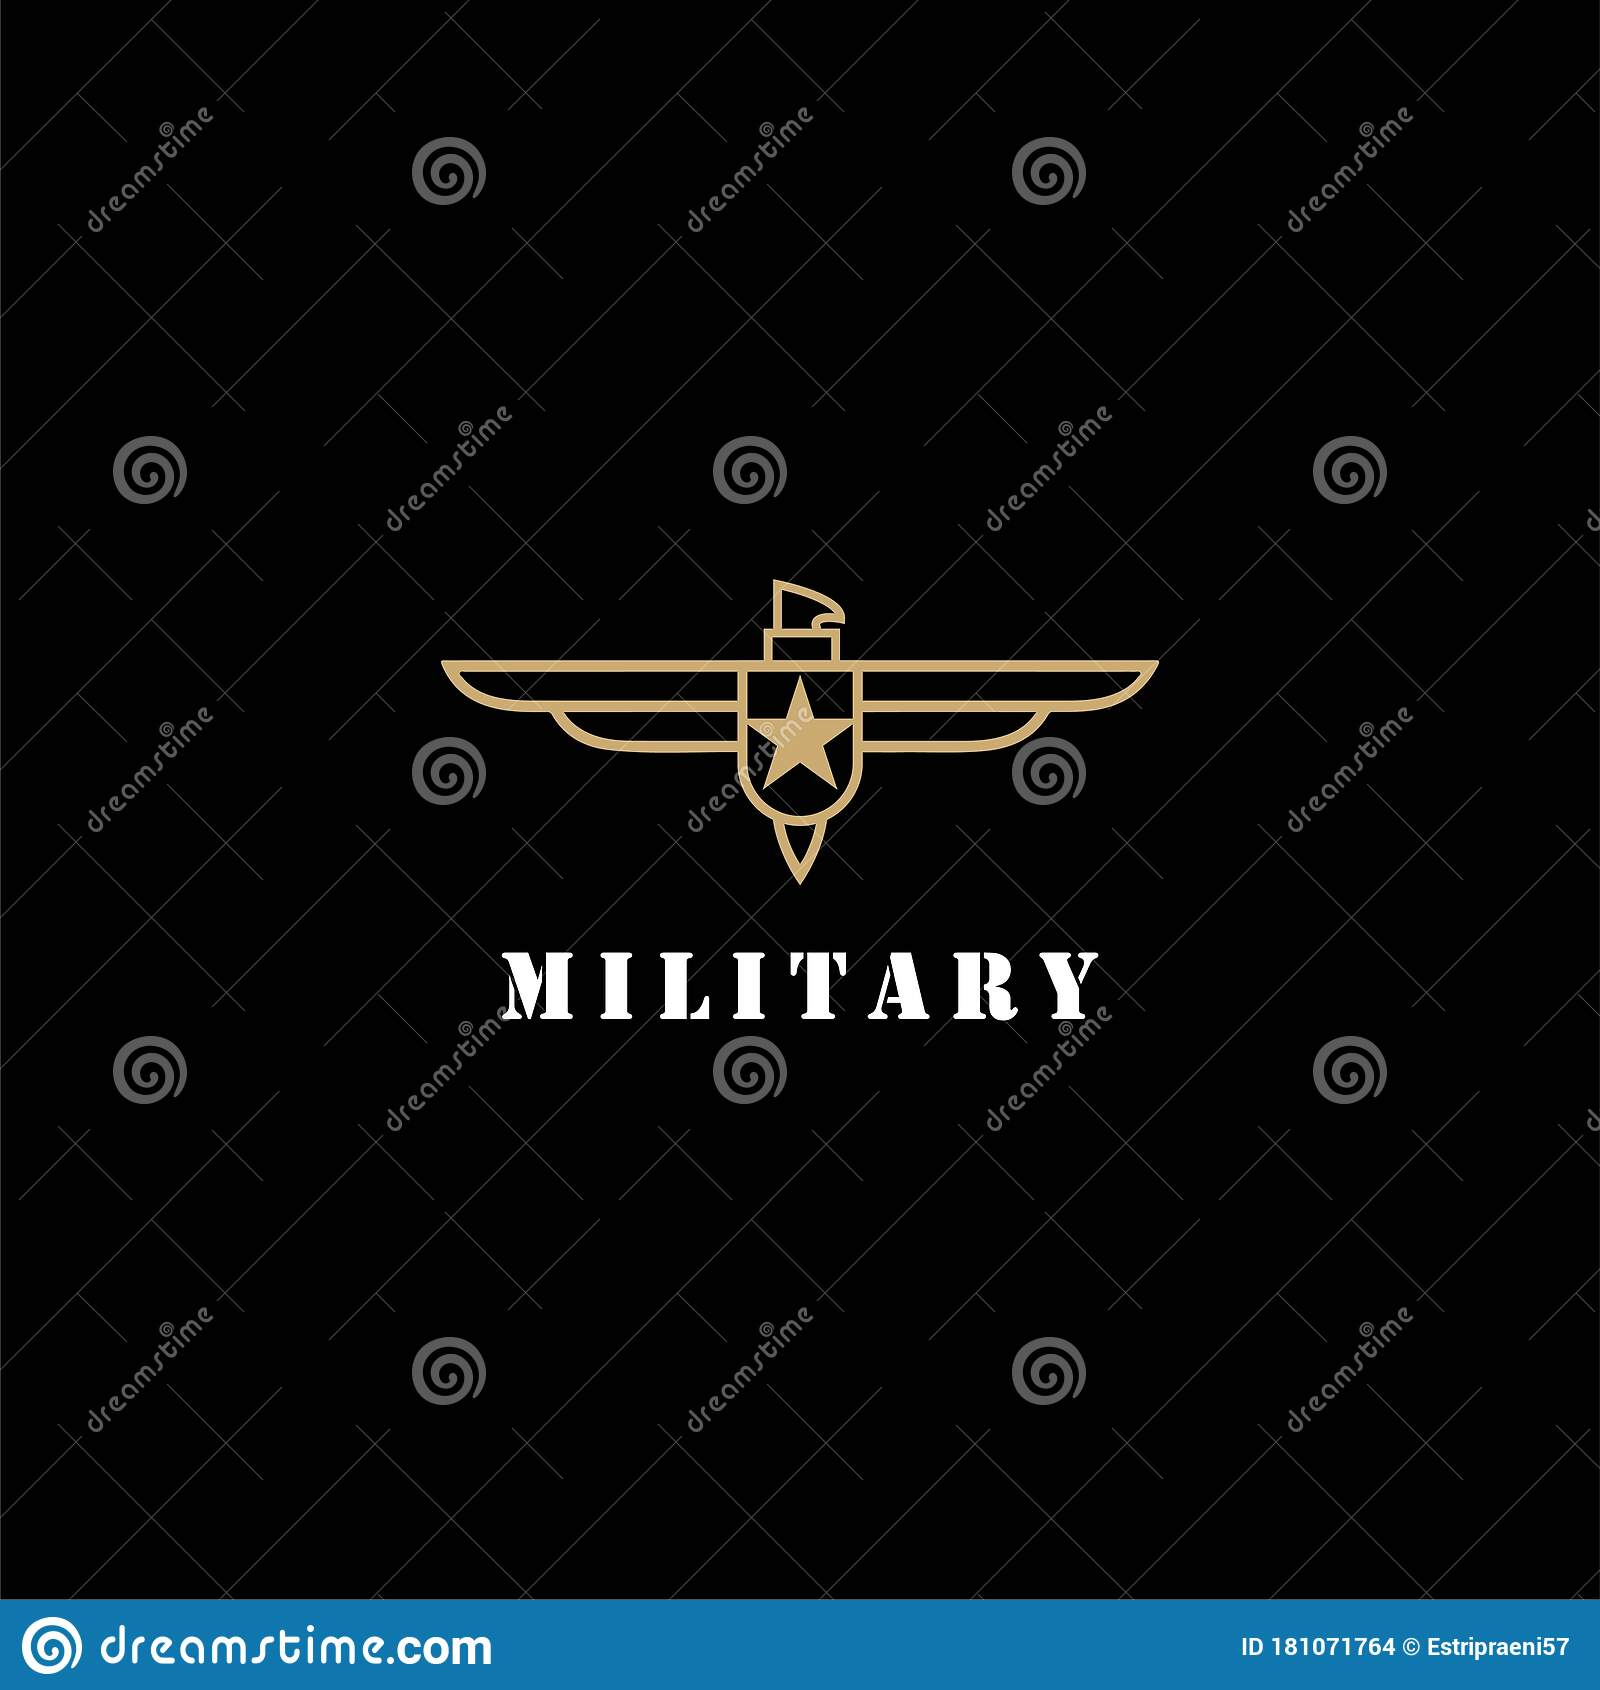 Eagle Hawk Falcon Line Style Military Badge Logo Design